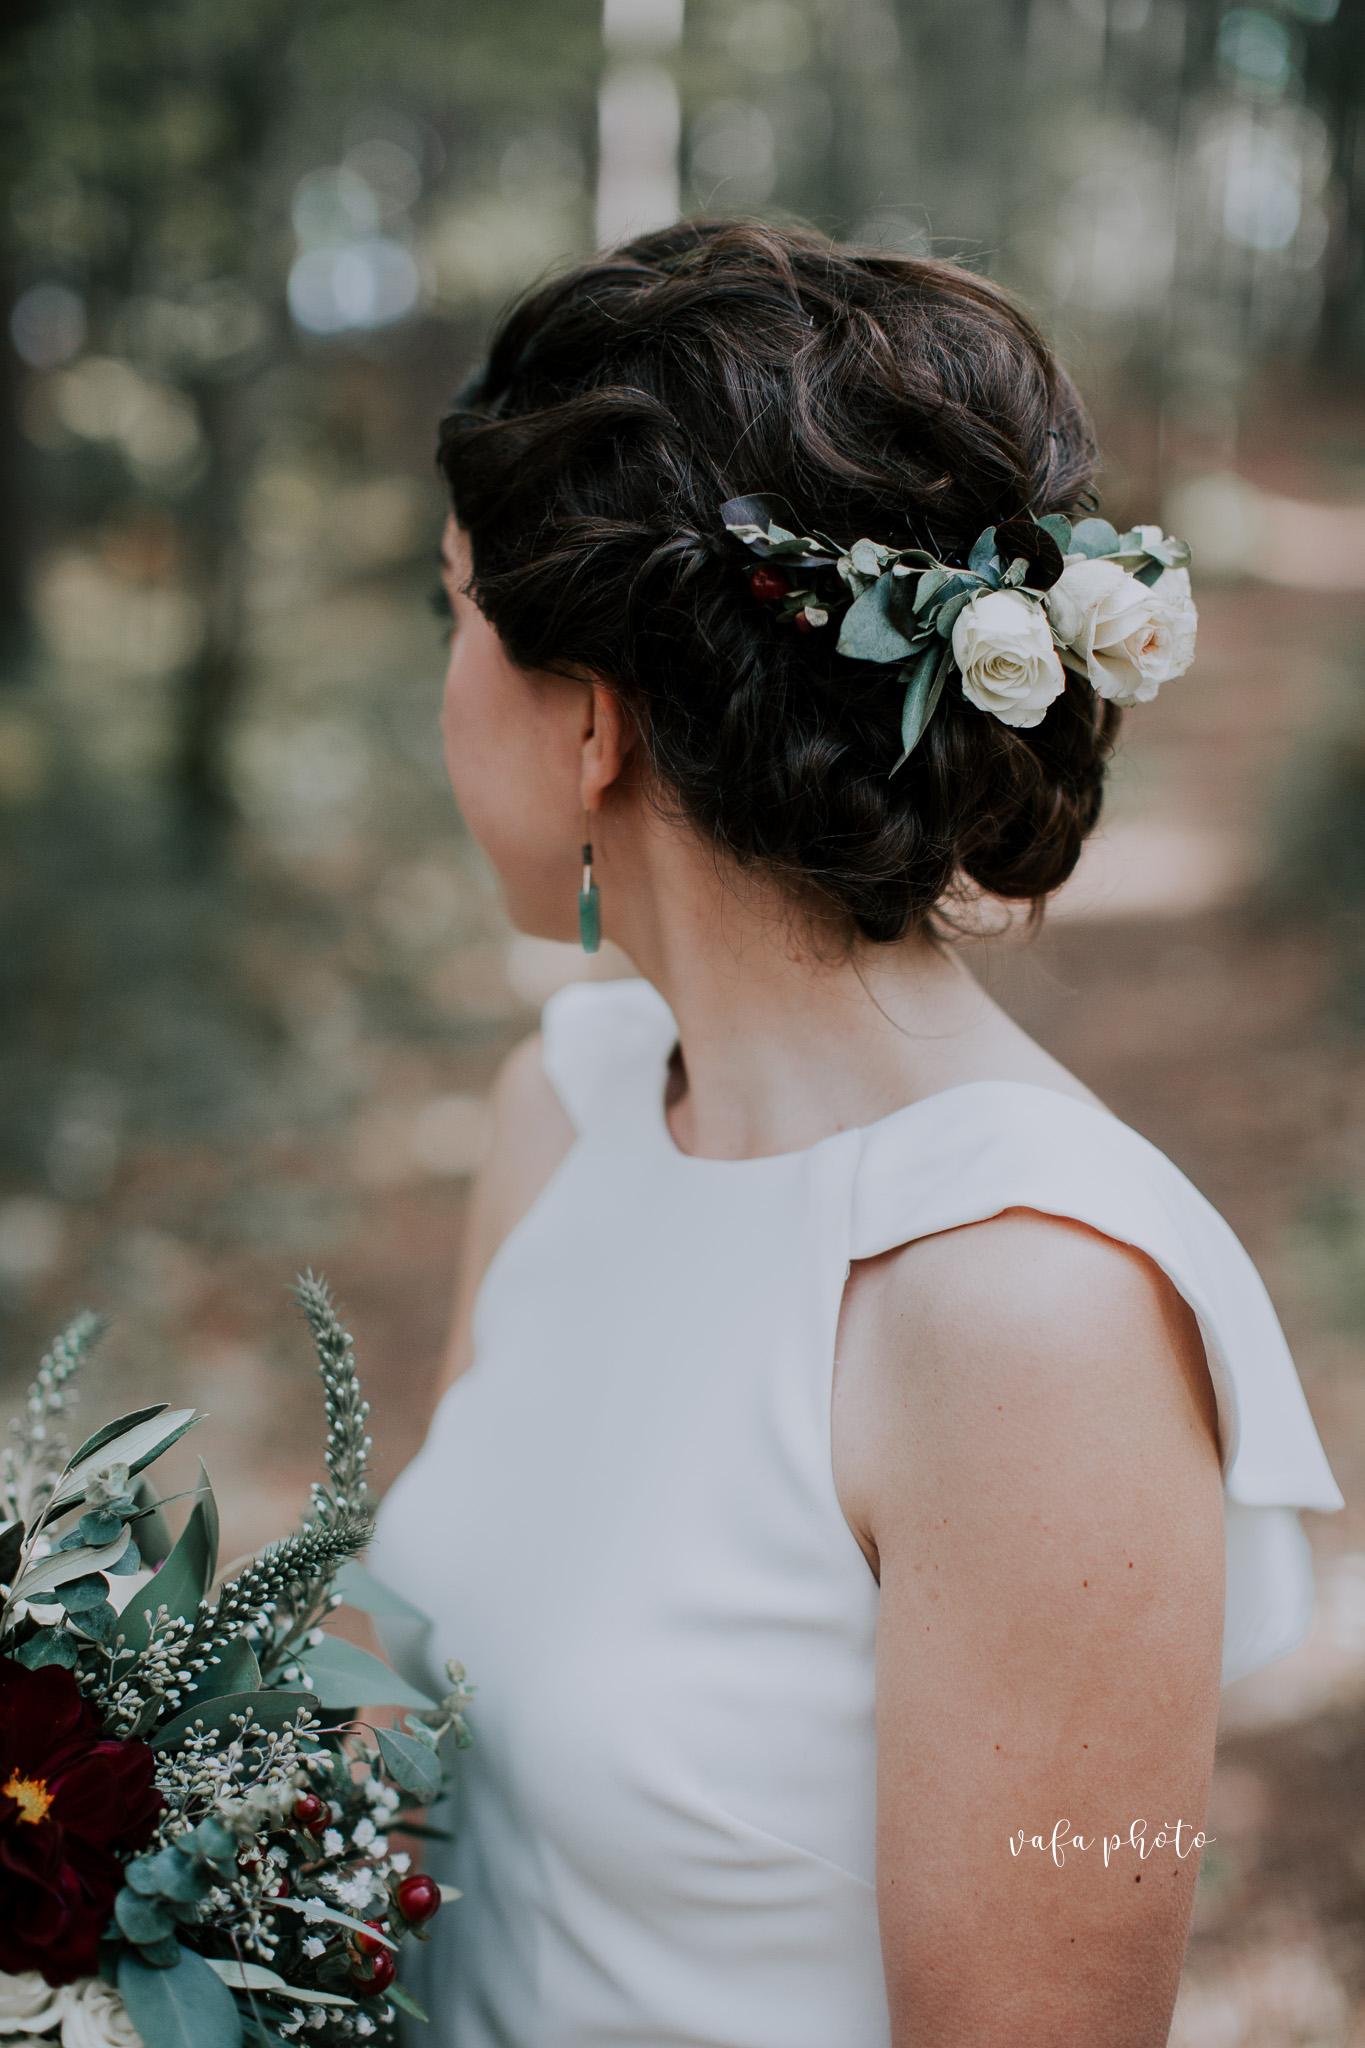 Little-Presque-Isle-Michigan-Wedding-Kim-Kyle-Vafa-Photo-95.jpg